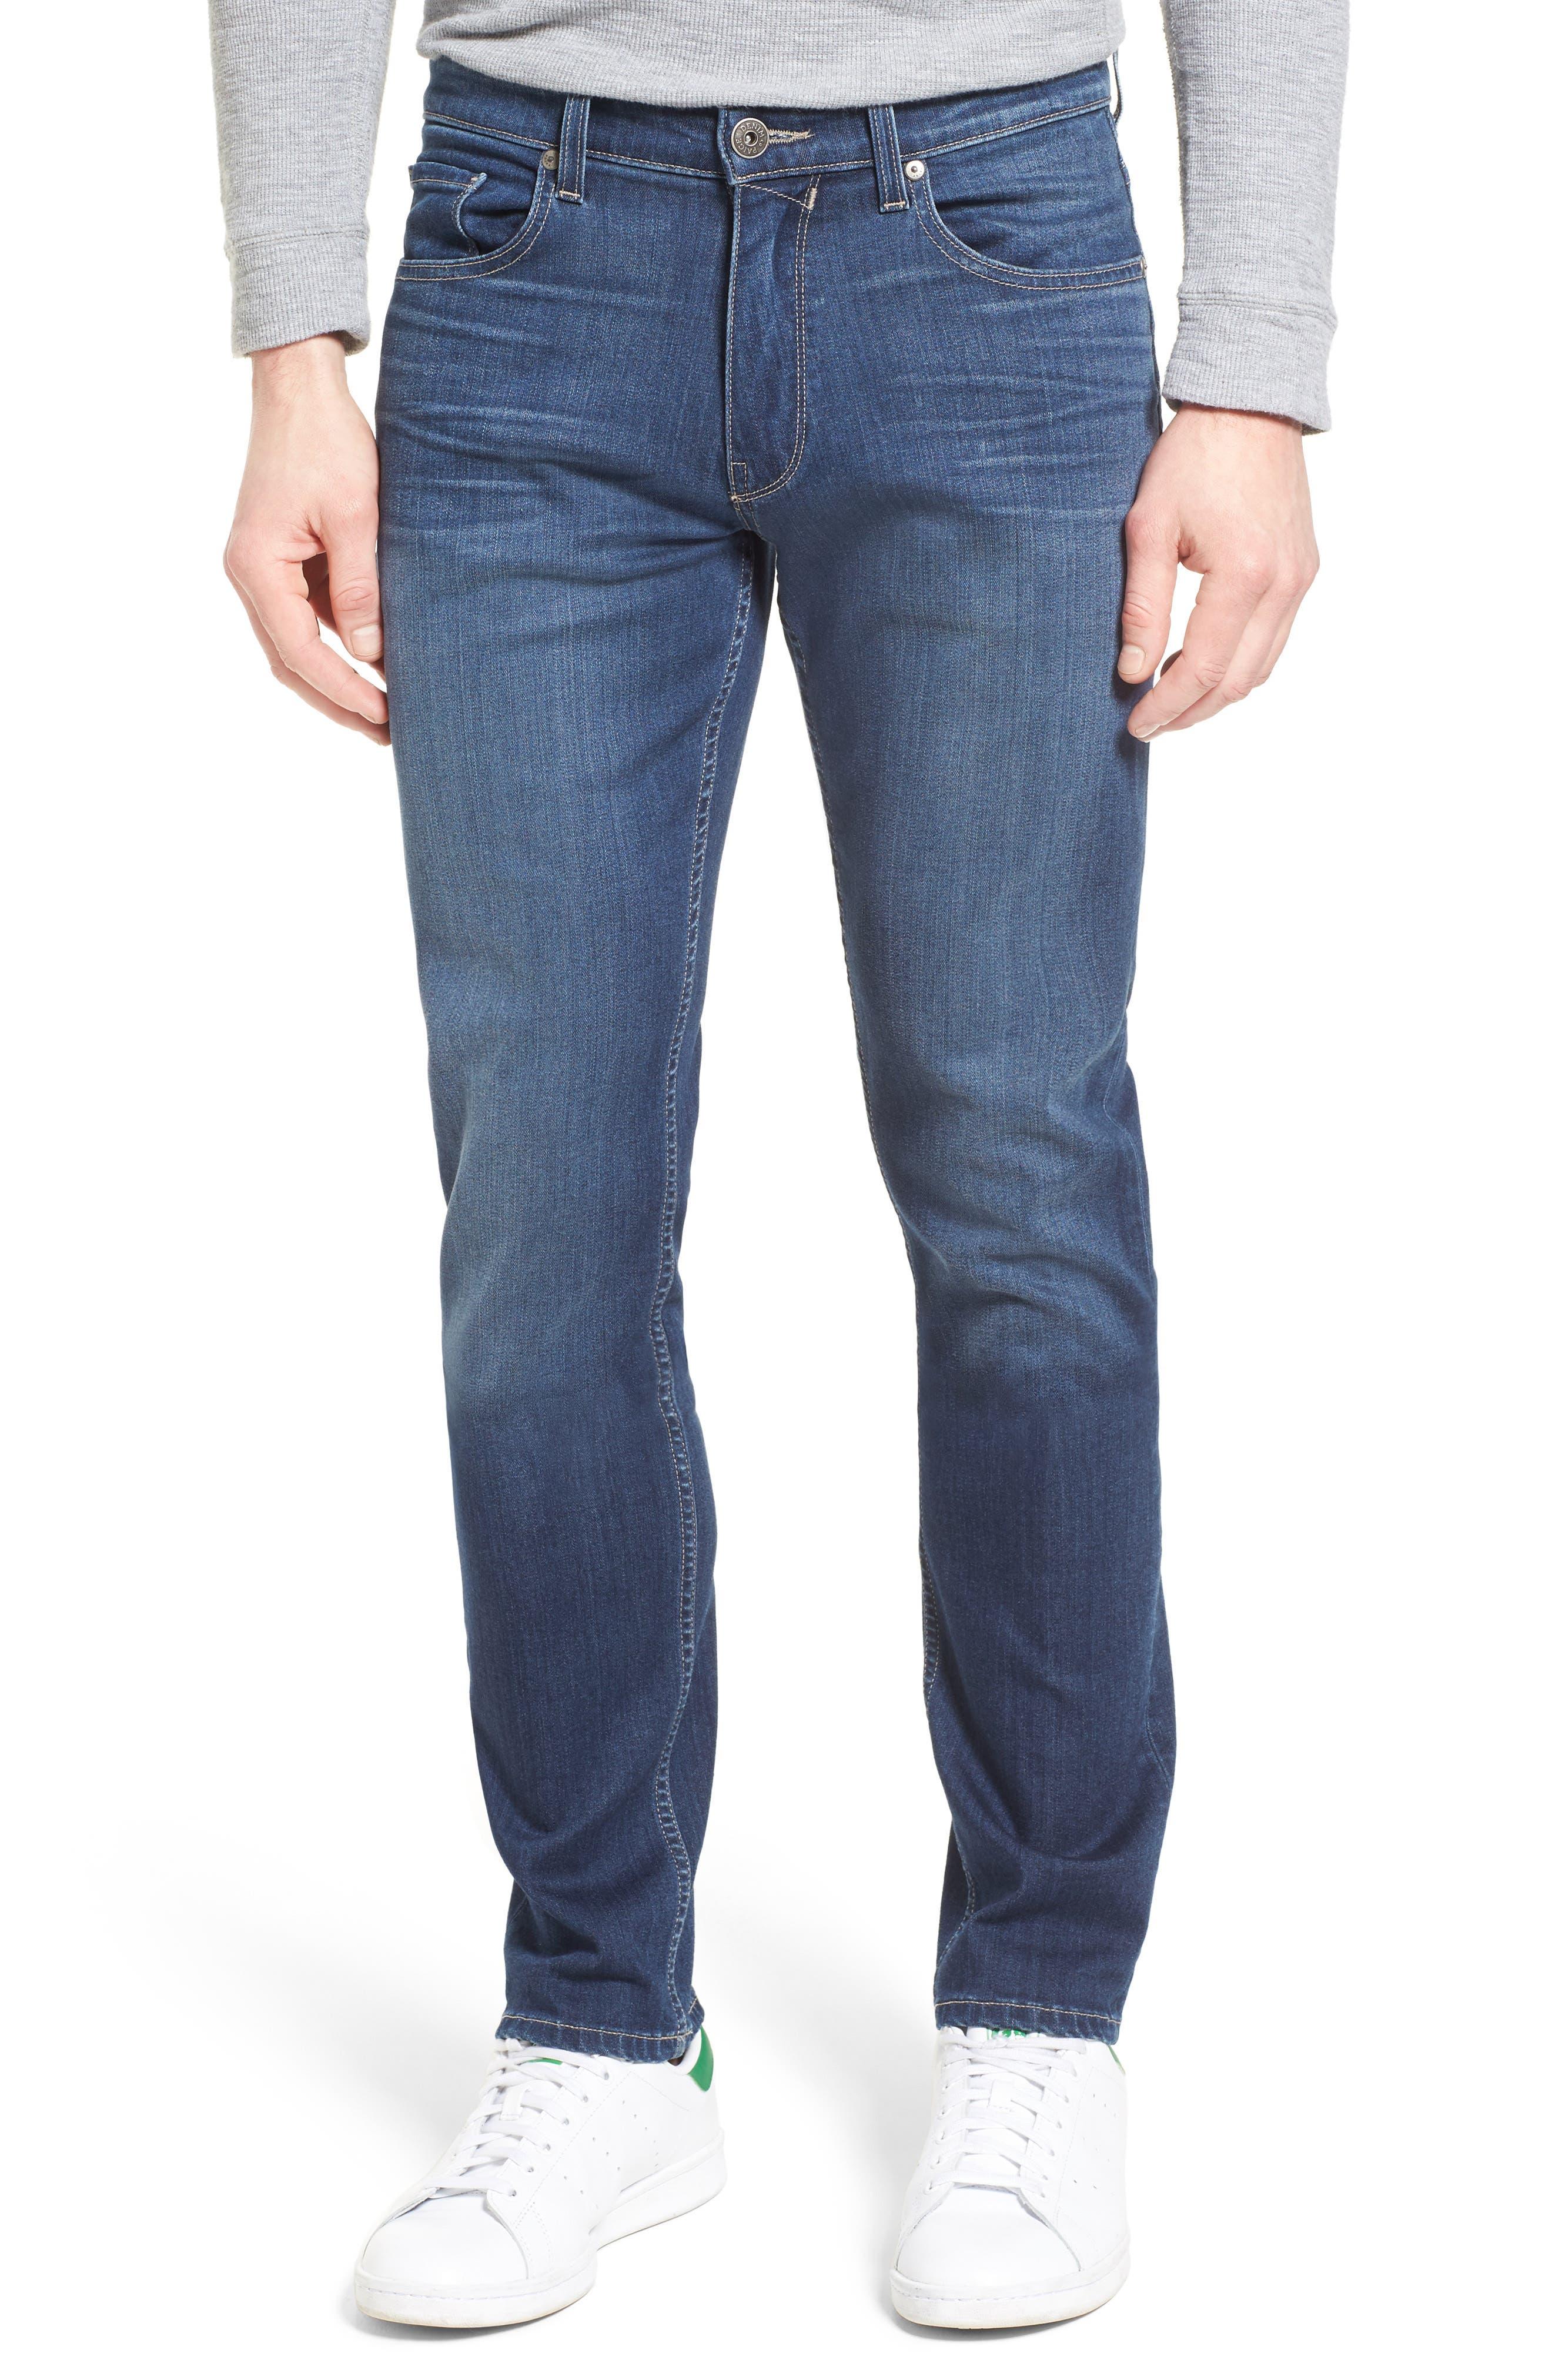 Transcend - Lennox Straight Leg Jeans,                             Main thumbnail 1, color,                             400